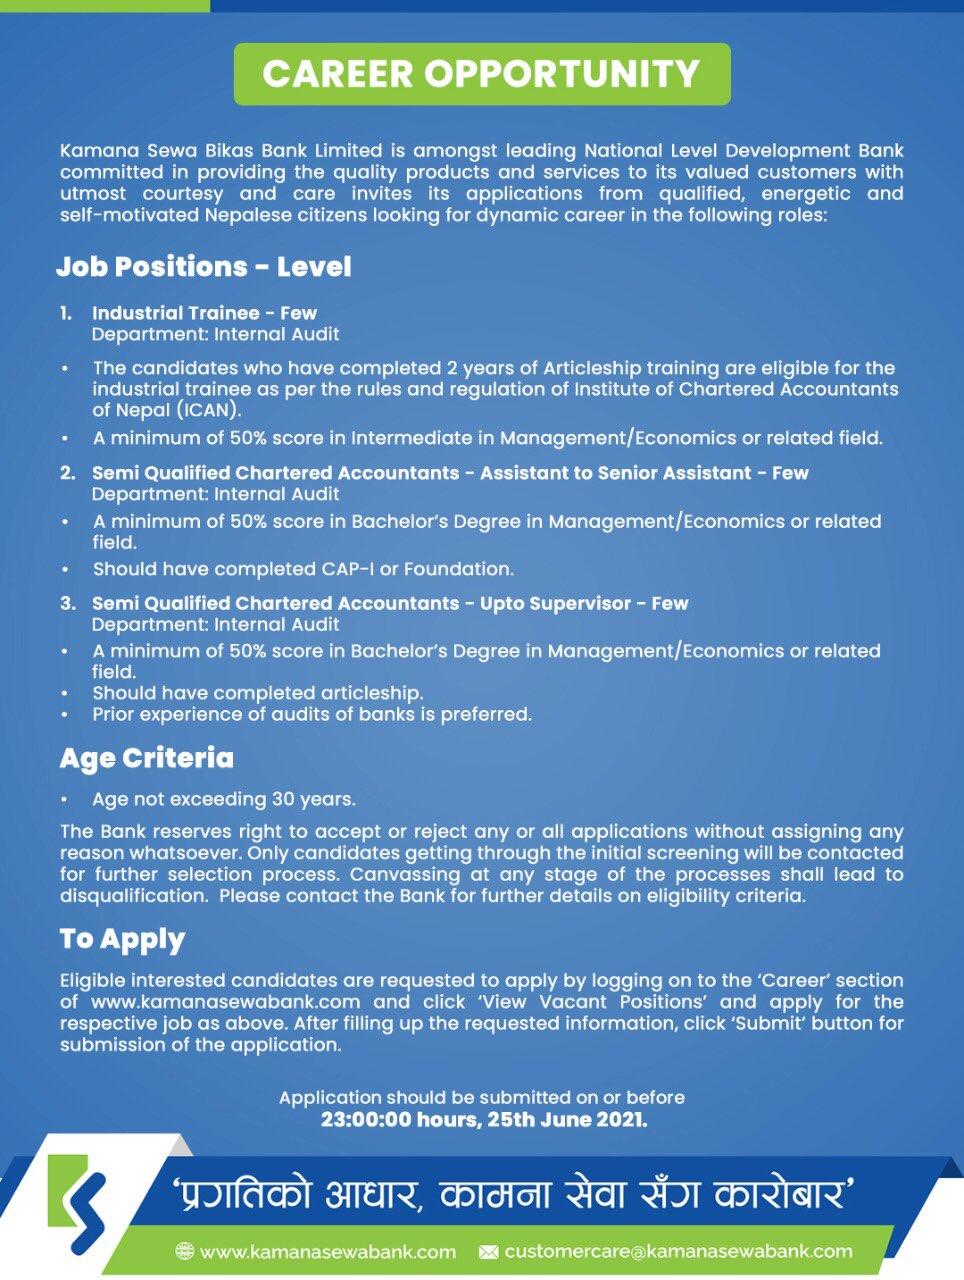 Kamana Sewa Bikas Bank Limited Vacancy for Industrial Trainee and Semi Qualified CA